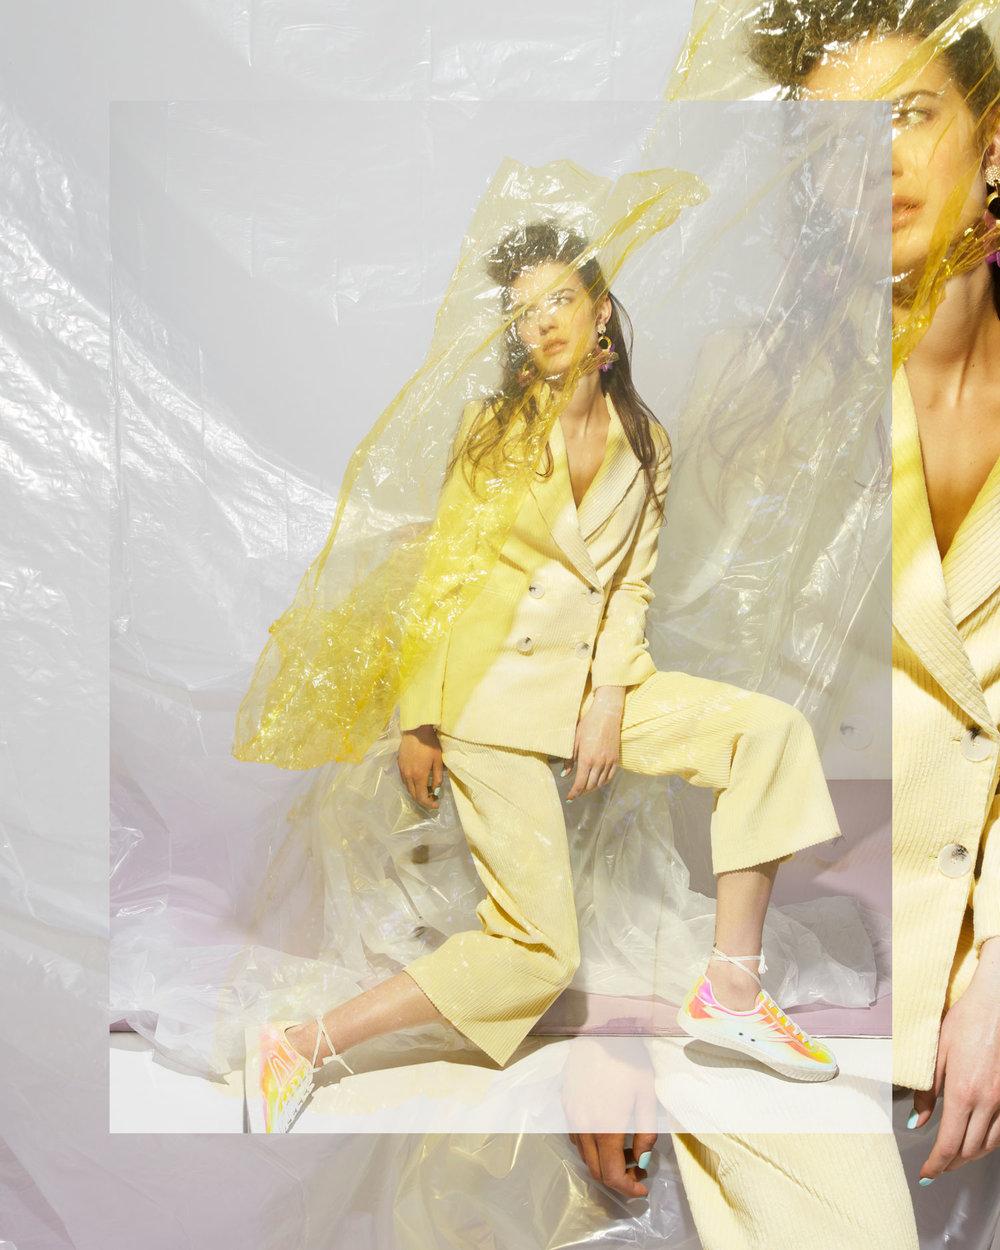 sarah-cochran-wardrobe-stylist-creative-stylist-art-director-minneapolis-9.jpg